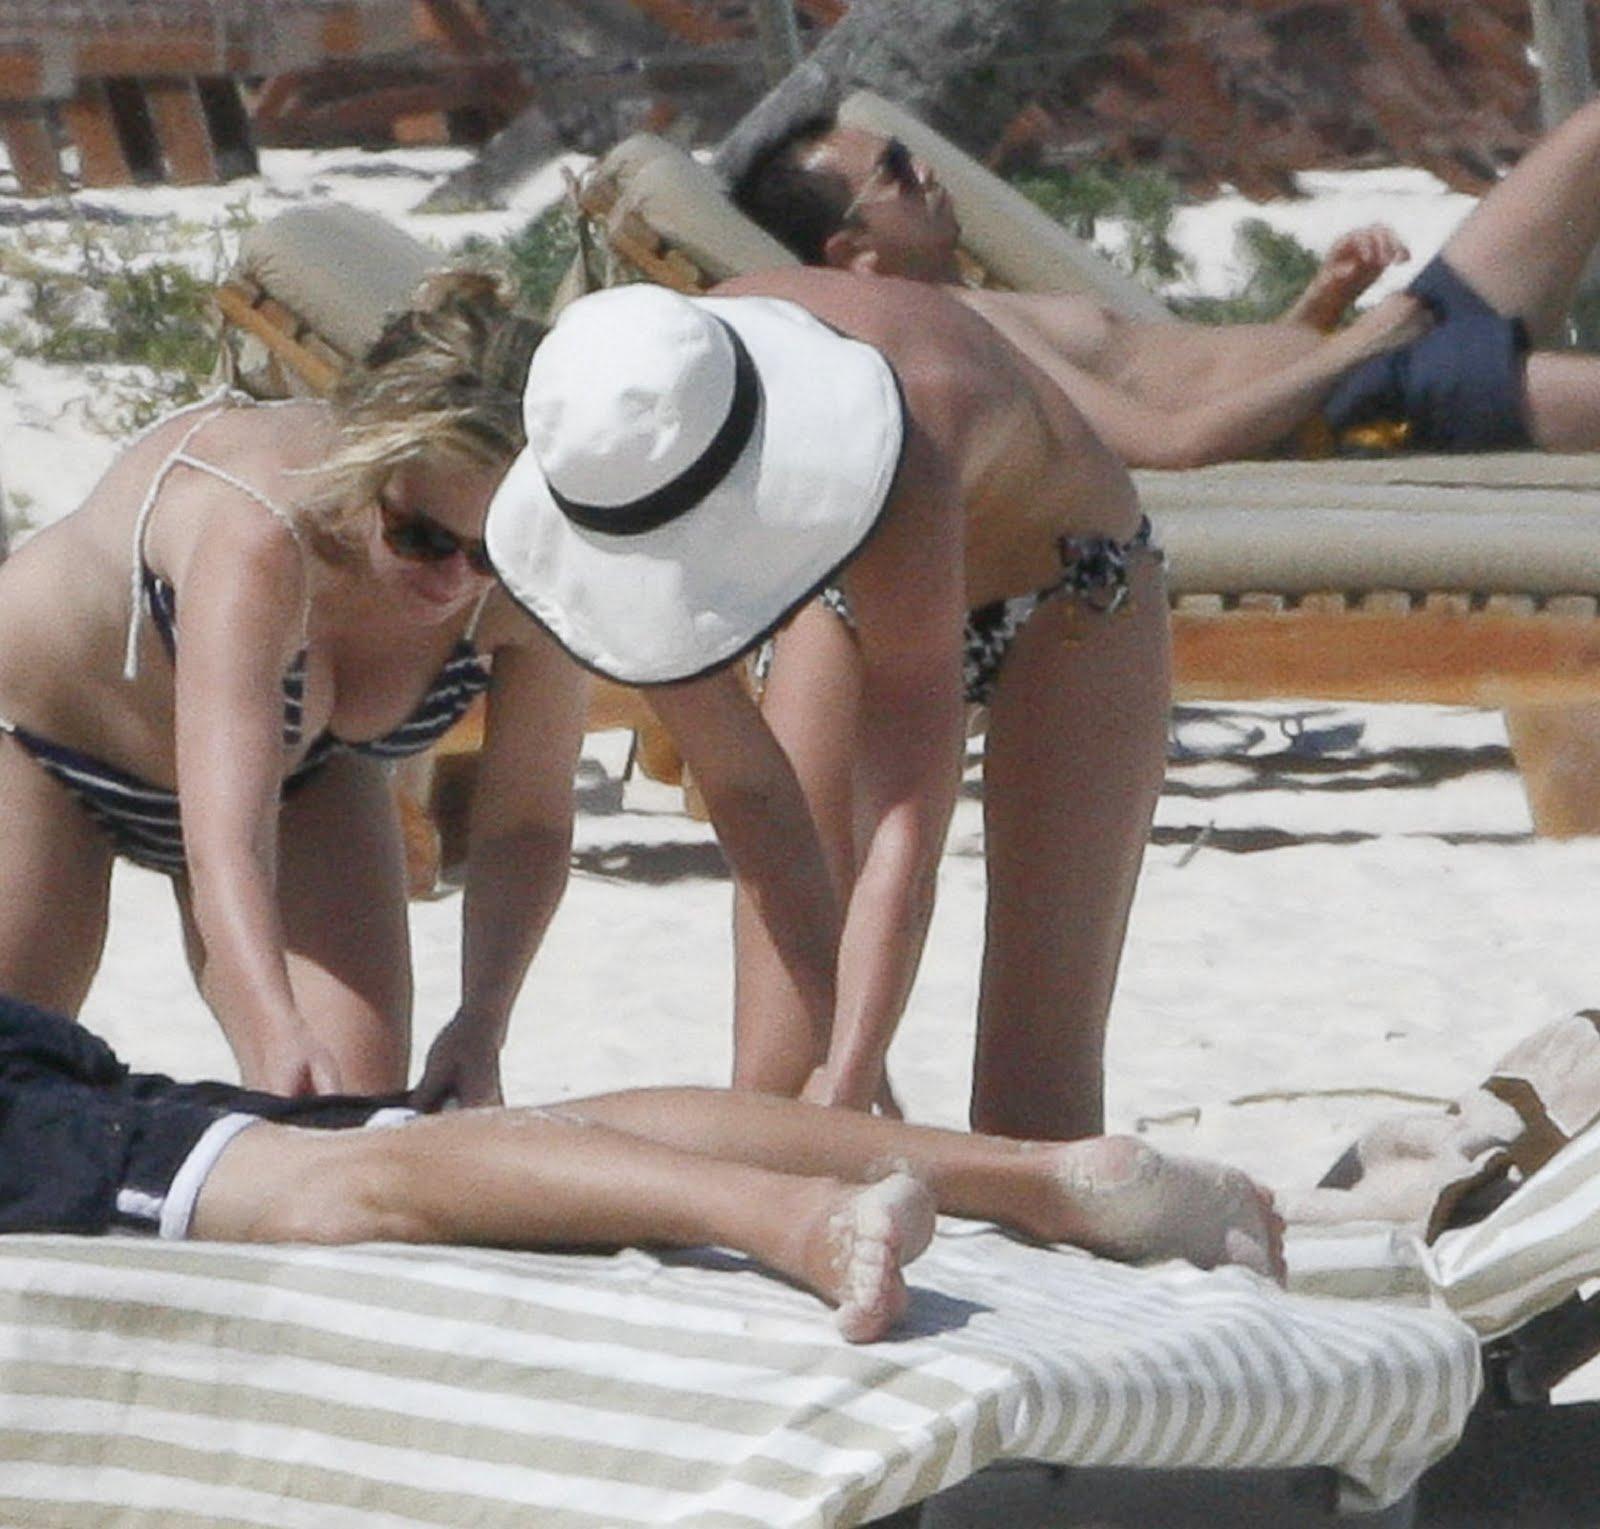 http://1.bp.blogspot.com/-LhFtdYl8bTw/TaOzm5uI0FI/AAAAAAAAEy4/4pToNr8lDW8/s1600/Kate+Bosworth+Topless+Bikini+Candids+At+The+Beach+www.GutterUncensoredPlus.com+009.jpg